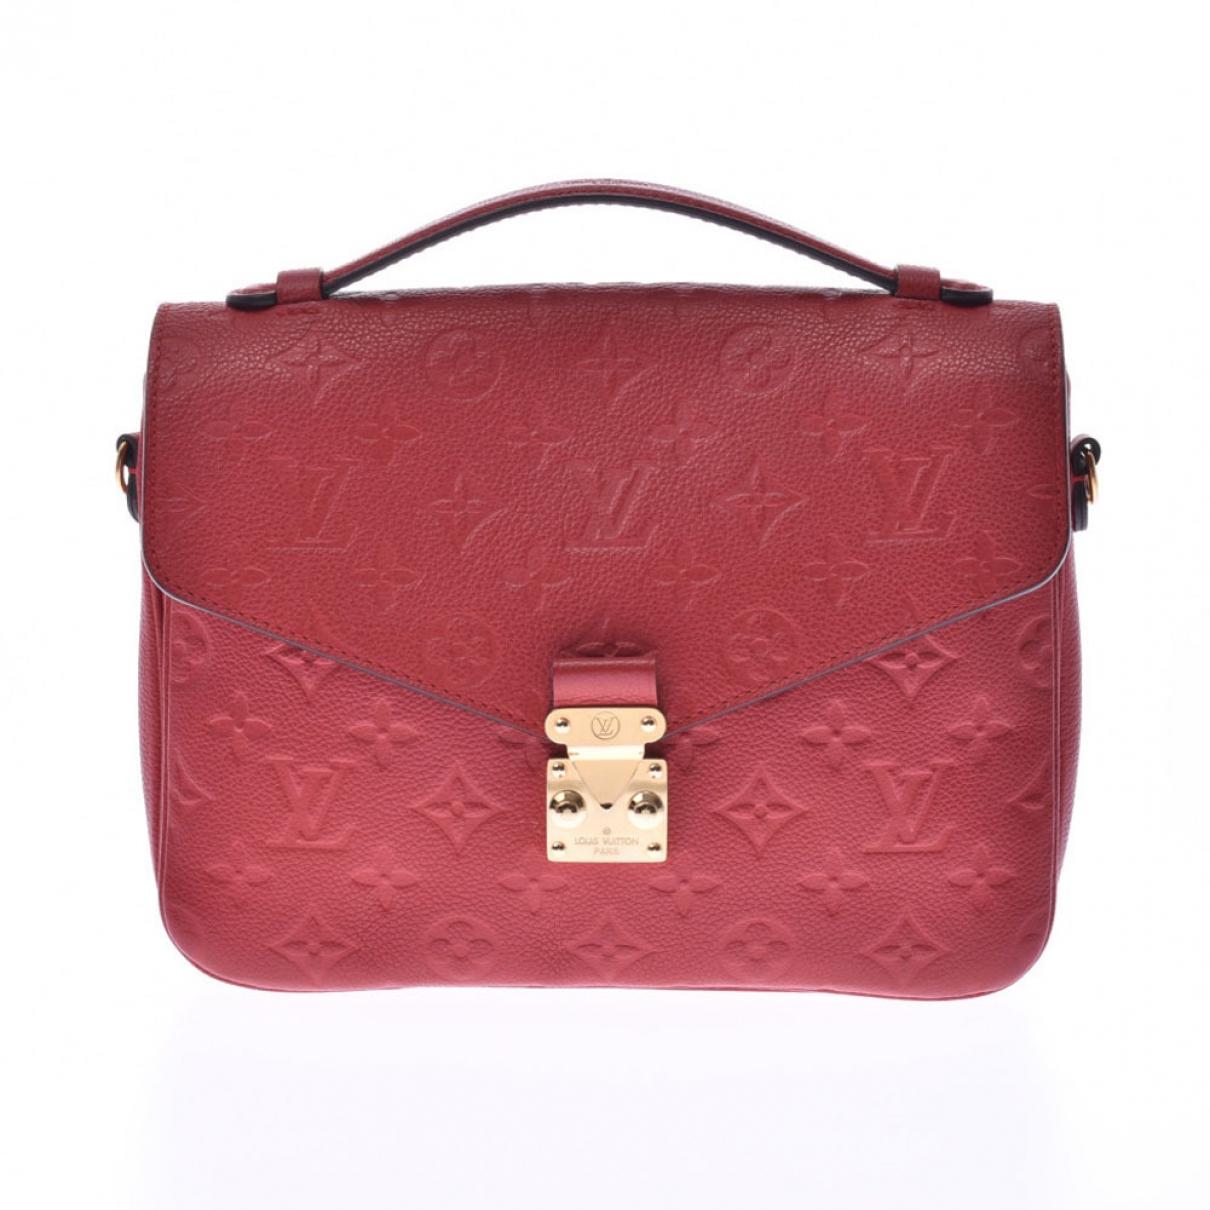 Louis Vuitton Metis Handtasche in  Rot Leder